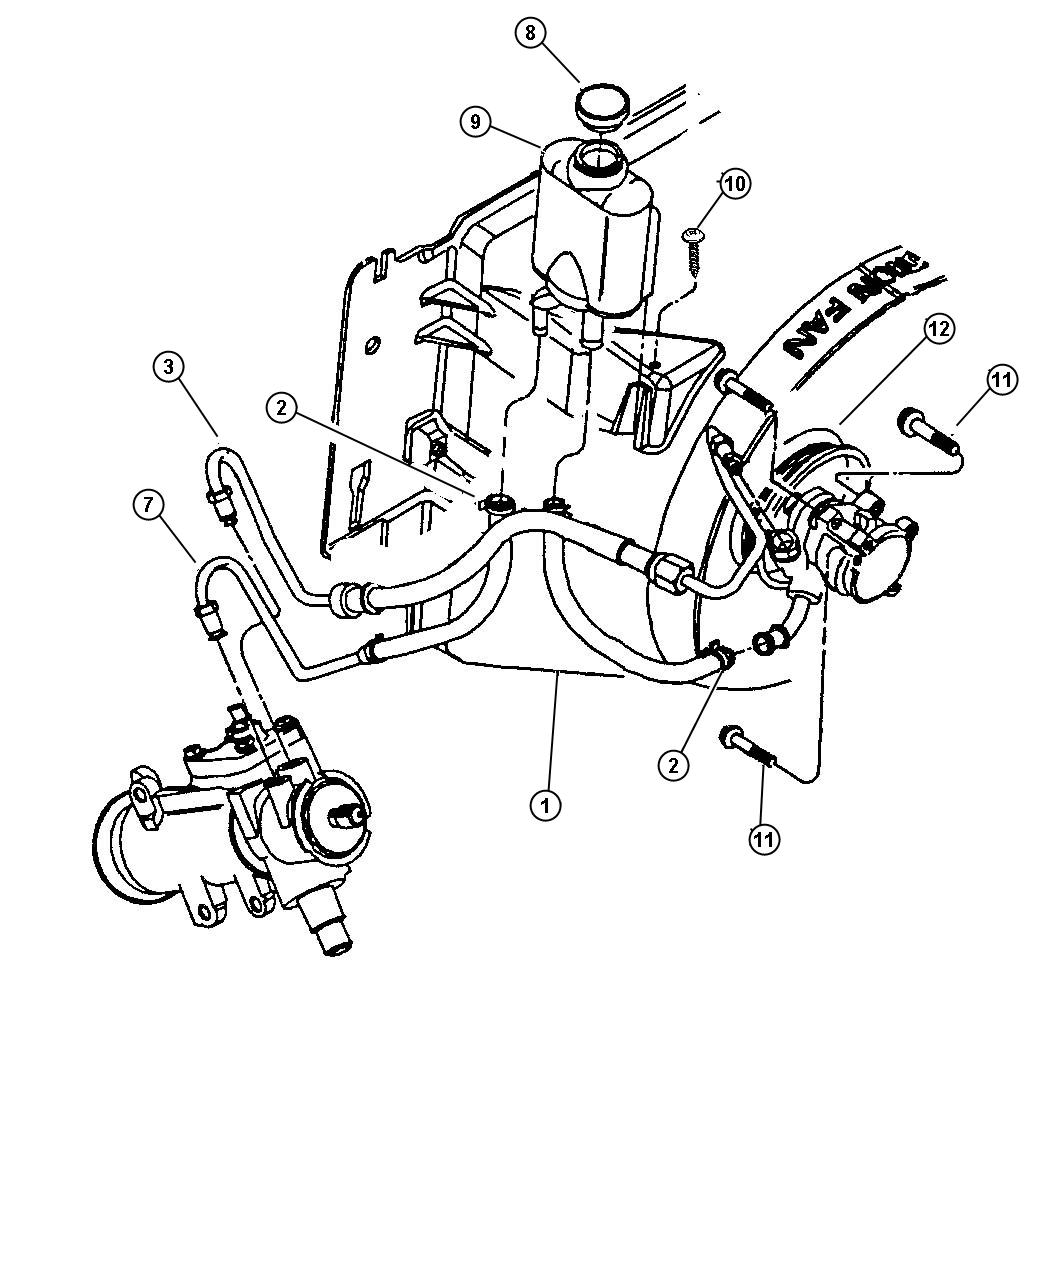 Jeep Wrangler Hoses And Reservoir 2 5l Engine